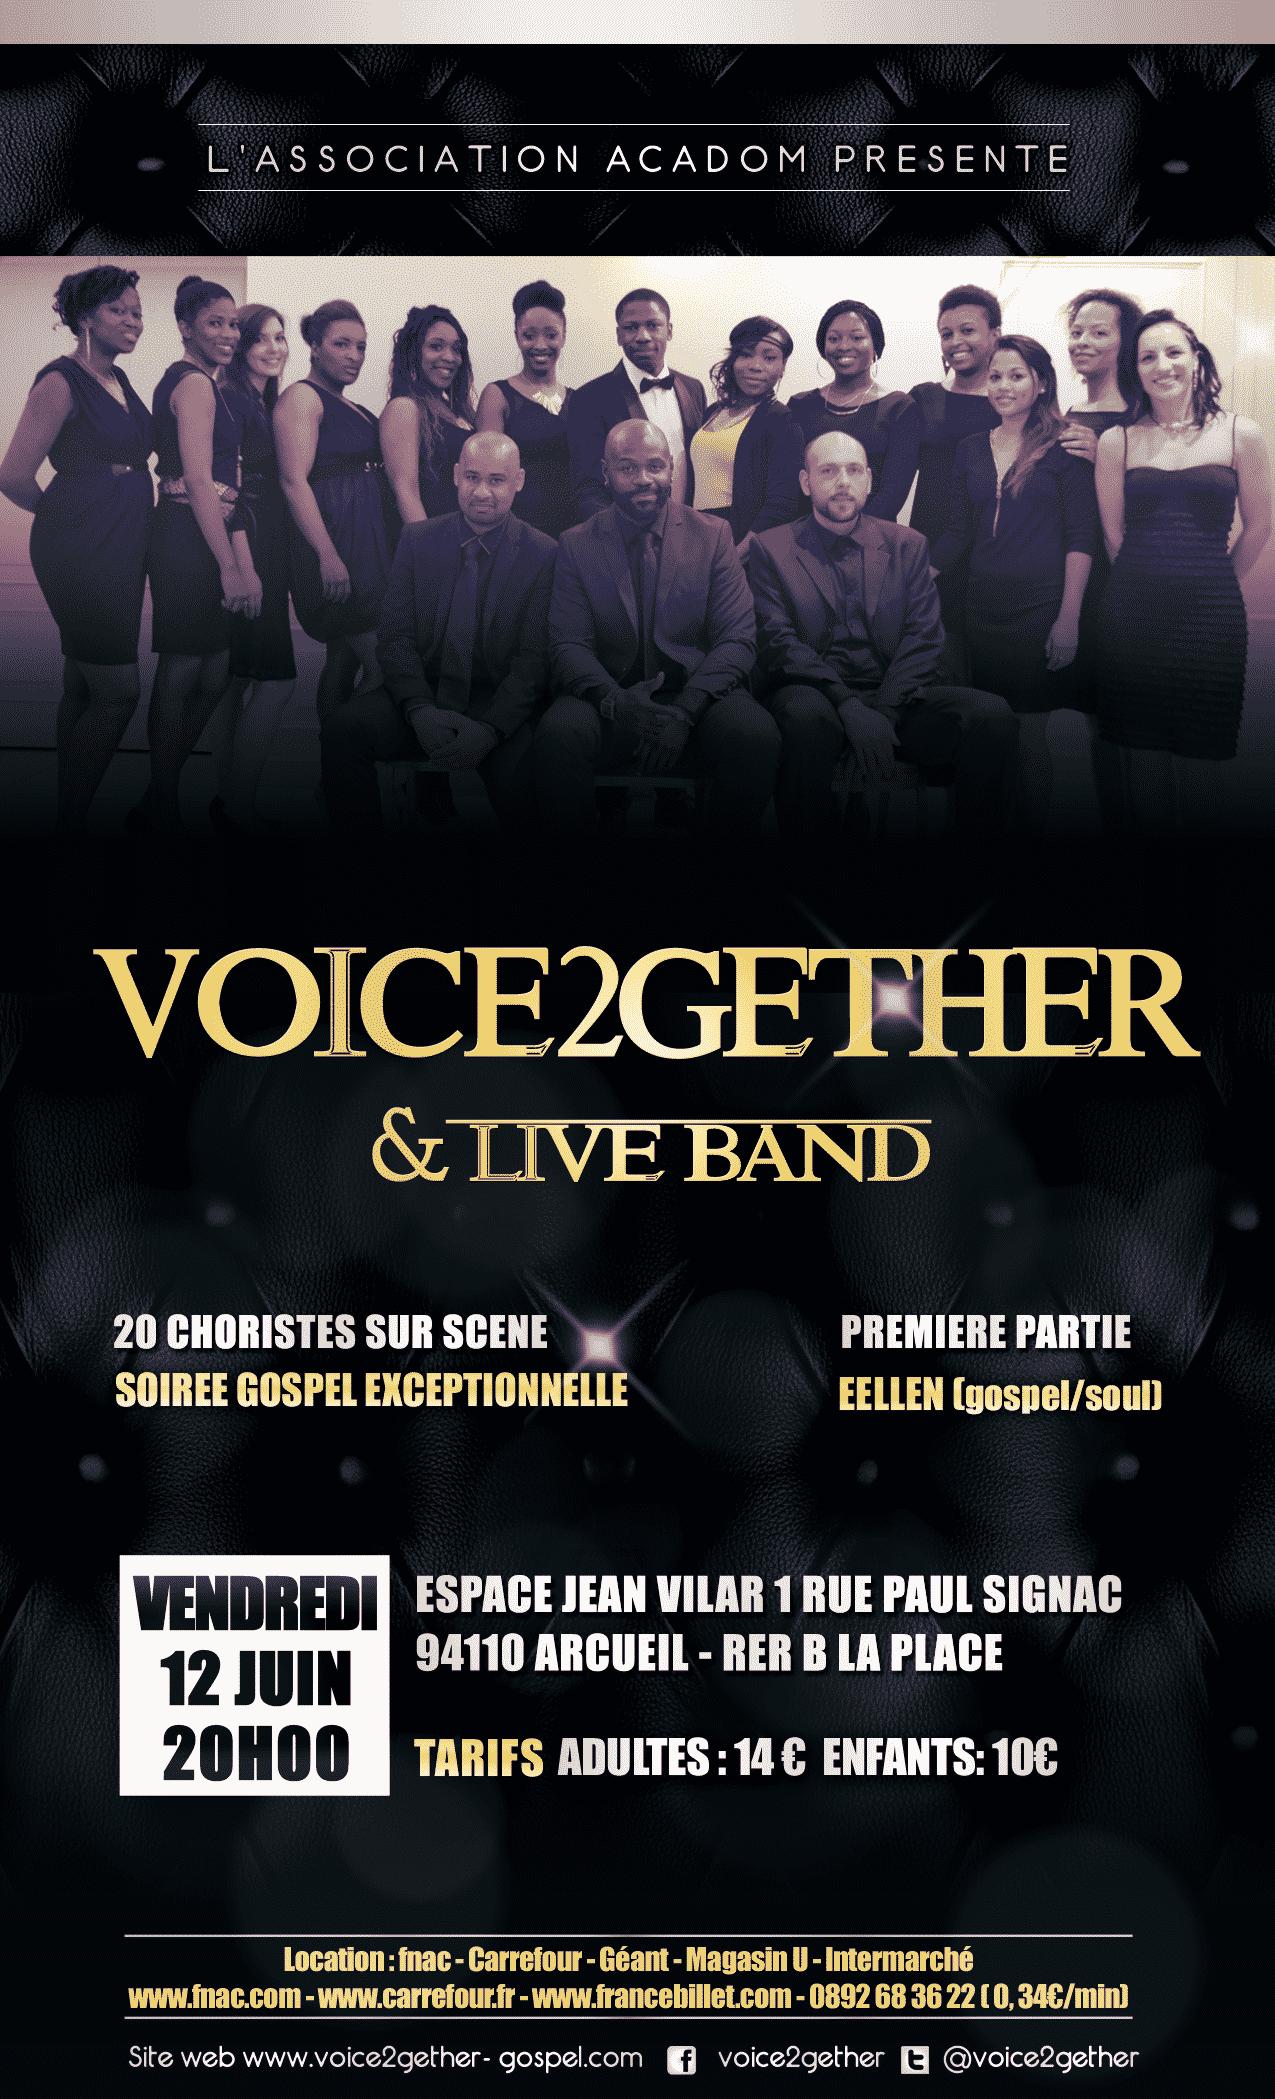 VOICE2GETHER & LIVE BAND, la chorale gospel urbain en concert